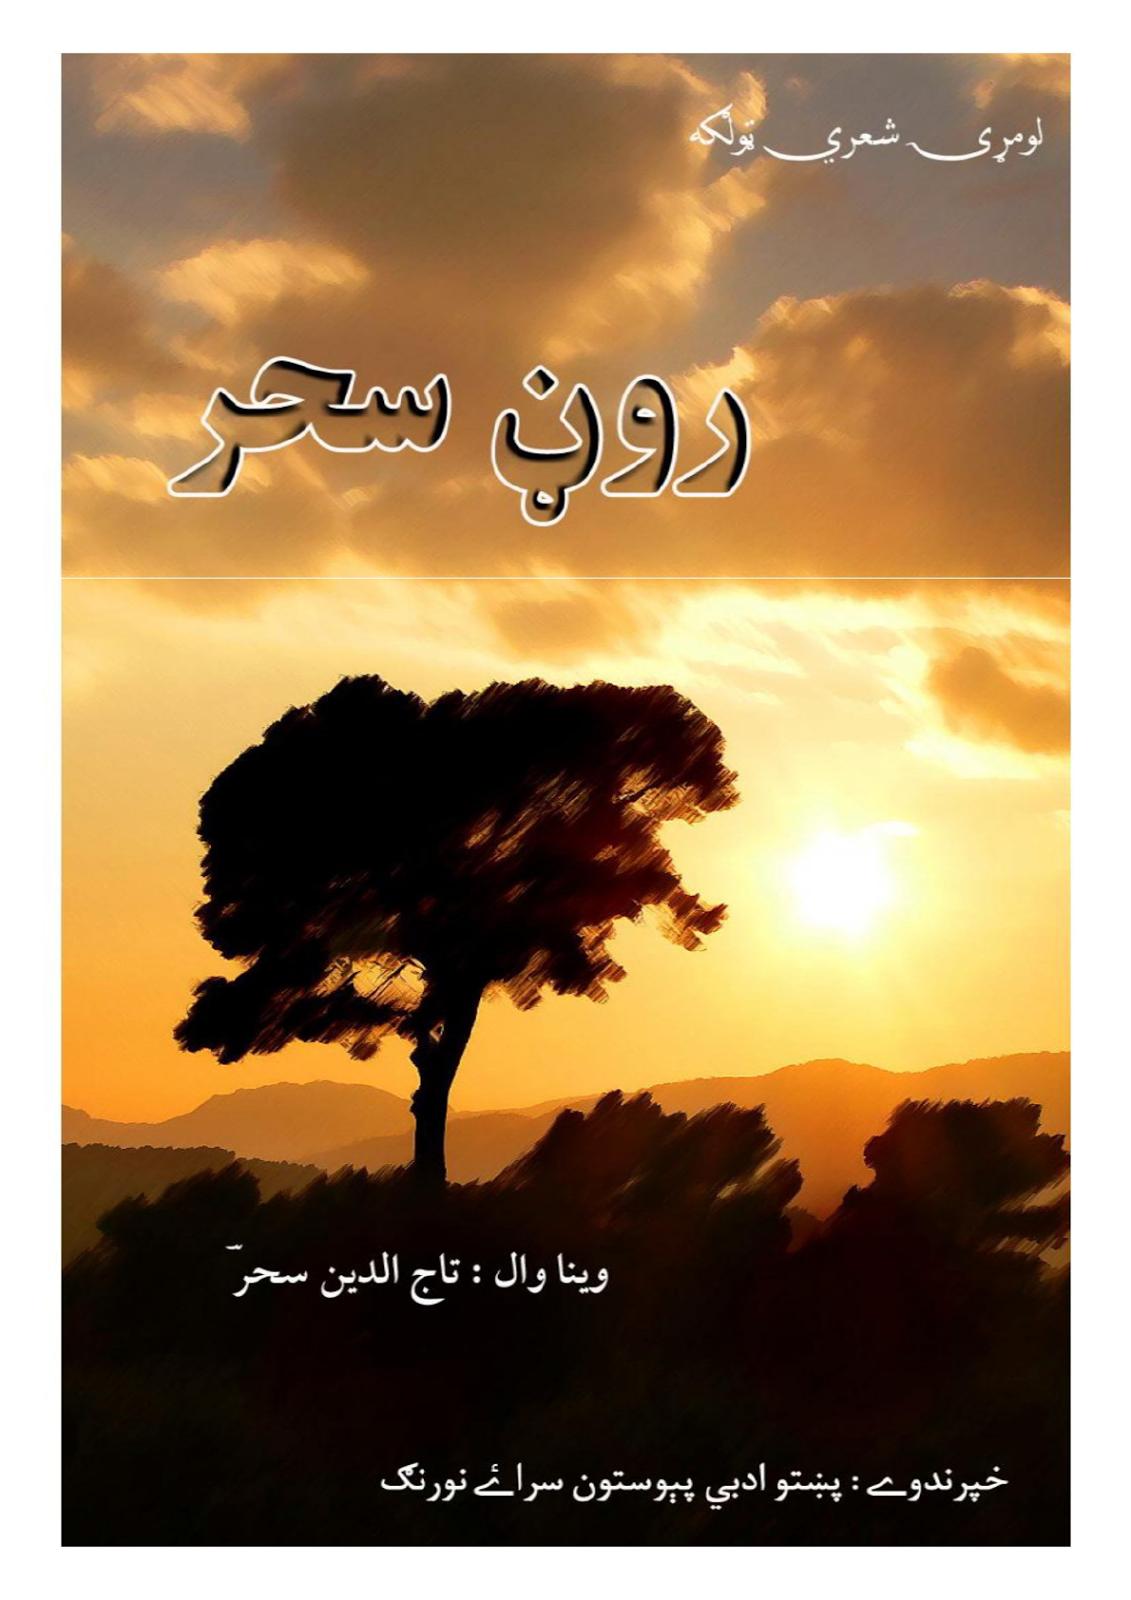 http://www.mediafire.com/view/3bcqbt9wnwe3mtw/Ronrr_Sahar_Pashto_Ebook.pdf